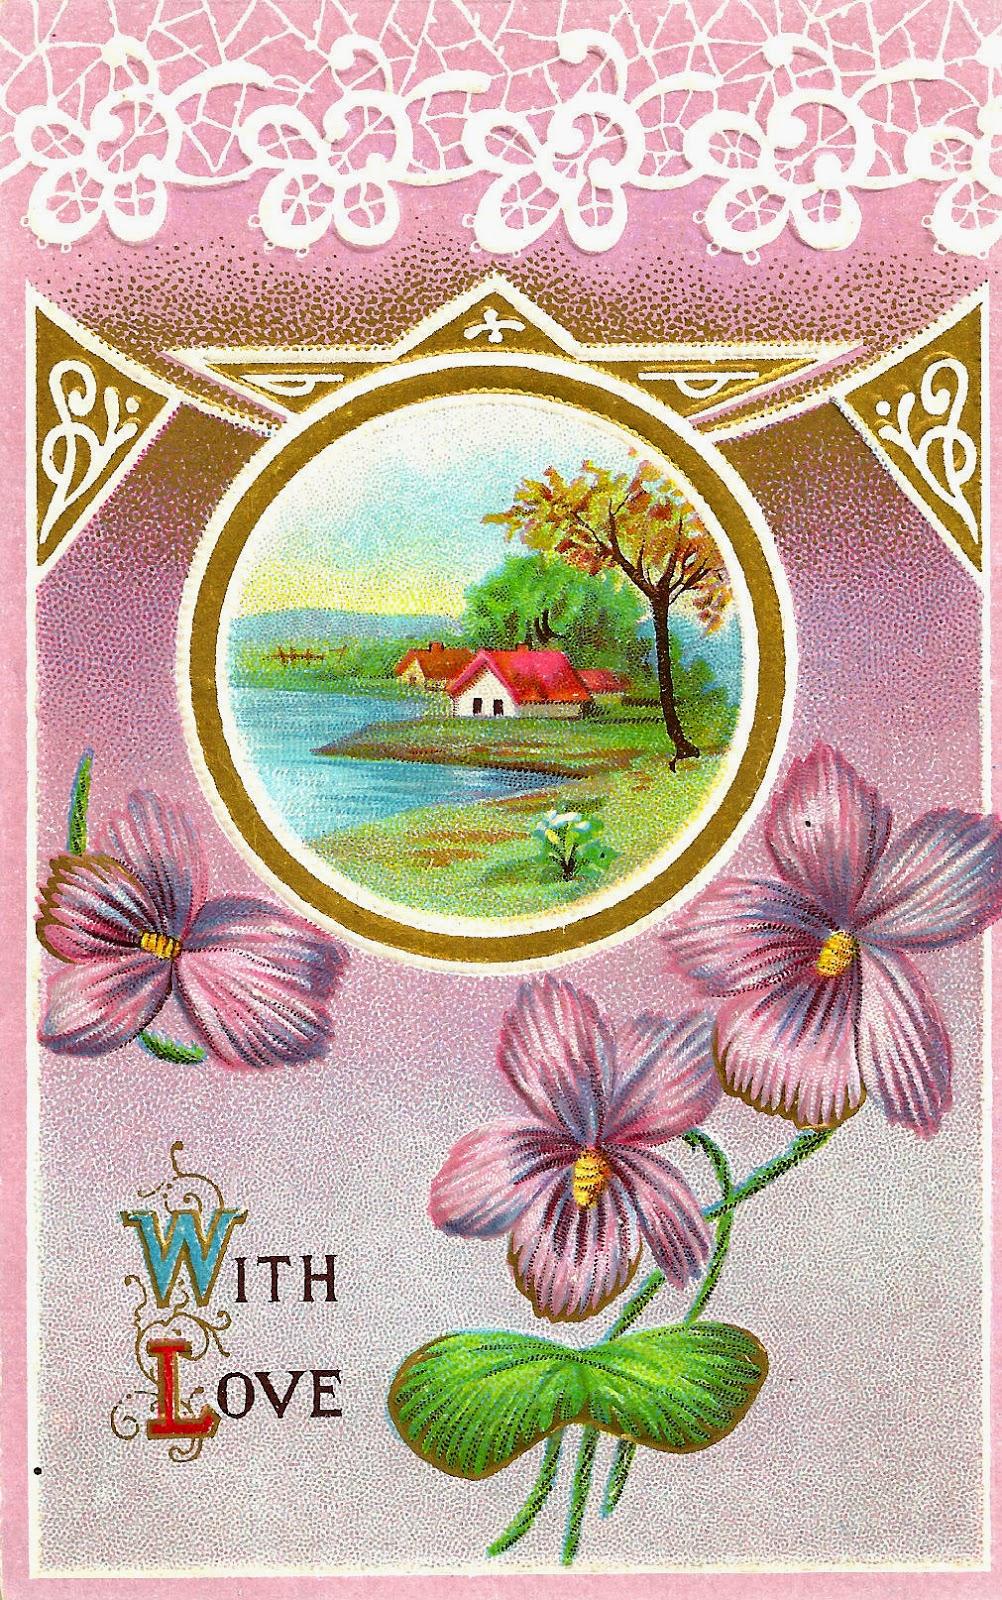 http://1.bp.blogspot.com/-e20Q0ft0hCI/VLRqKk9nvWI/AAAAAAAAU_c/4faF01TJmCc/s1600/with_love_pc_purple_flower_gm.jpg